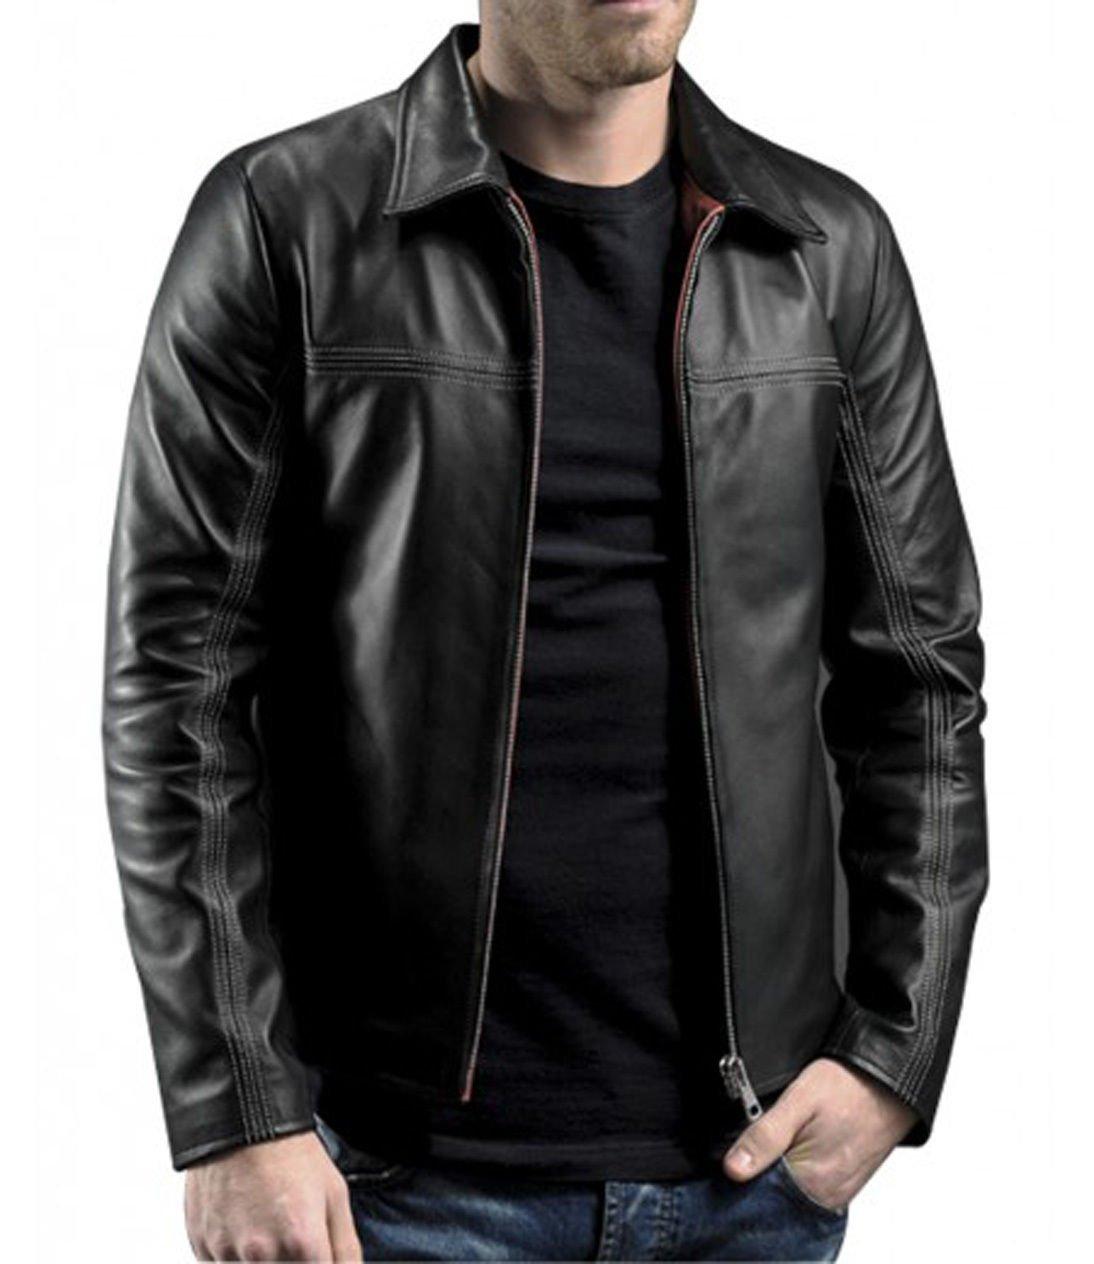 LAYER CAKE Mr X Daniel Black Vintage Slim Fit Motorcycle Men's Leather Jacket